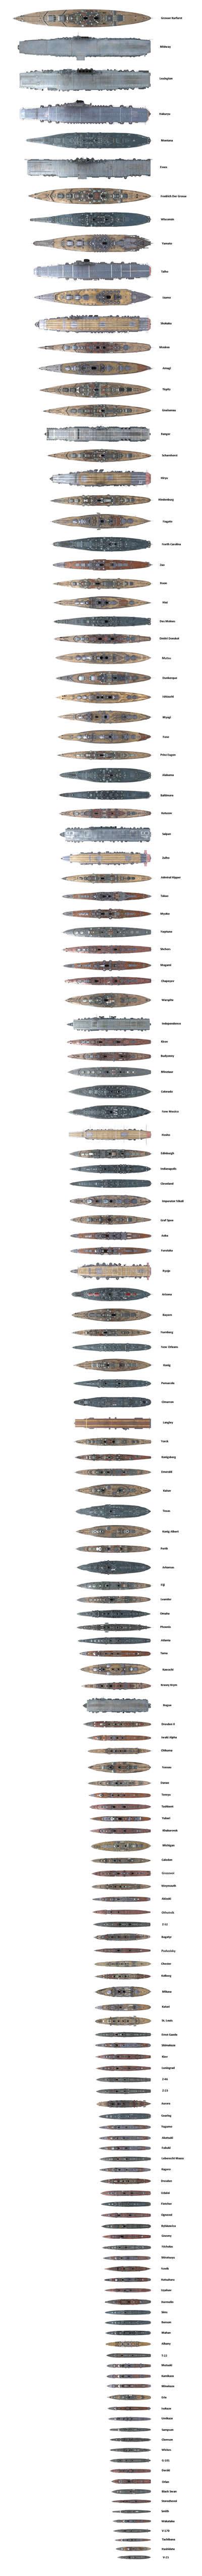 WoWS 全艦 サイズ 比較